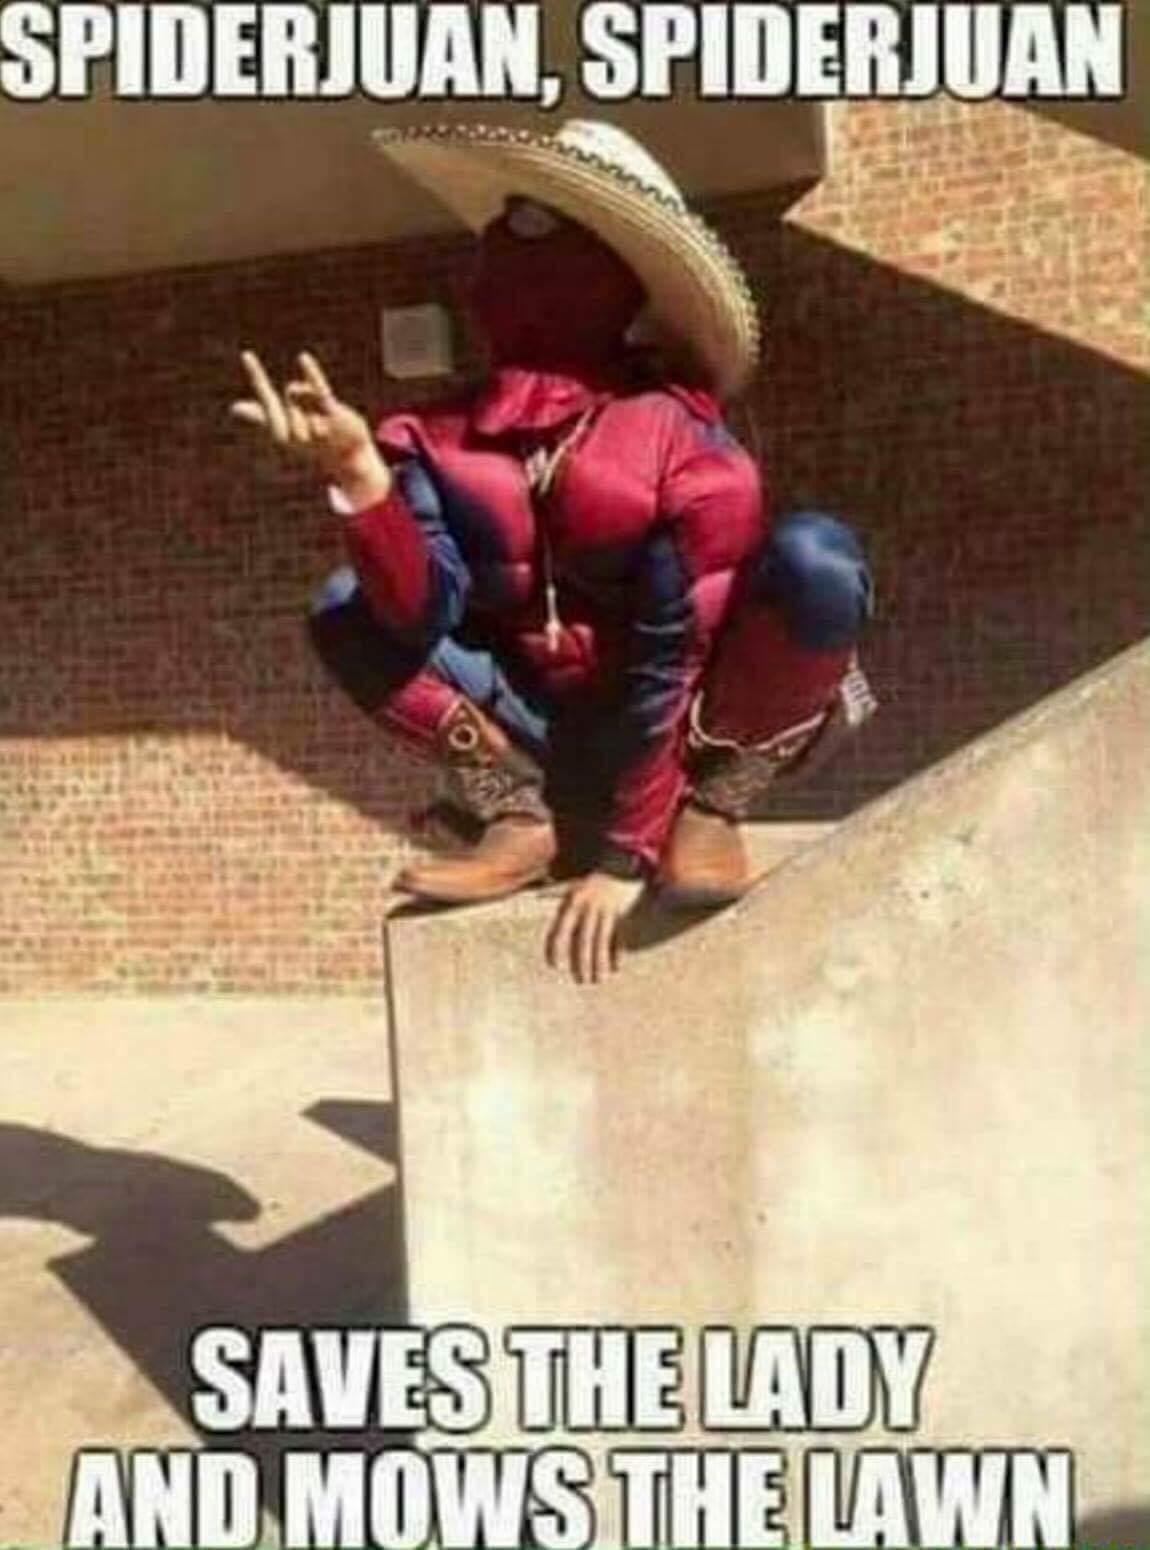 Spiderjuan - meme